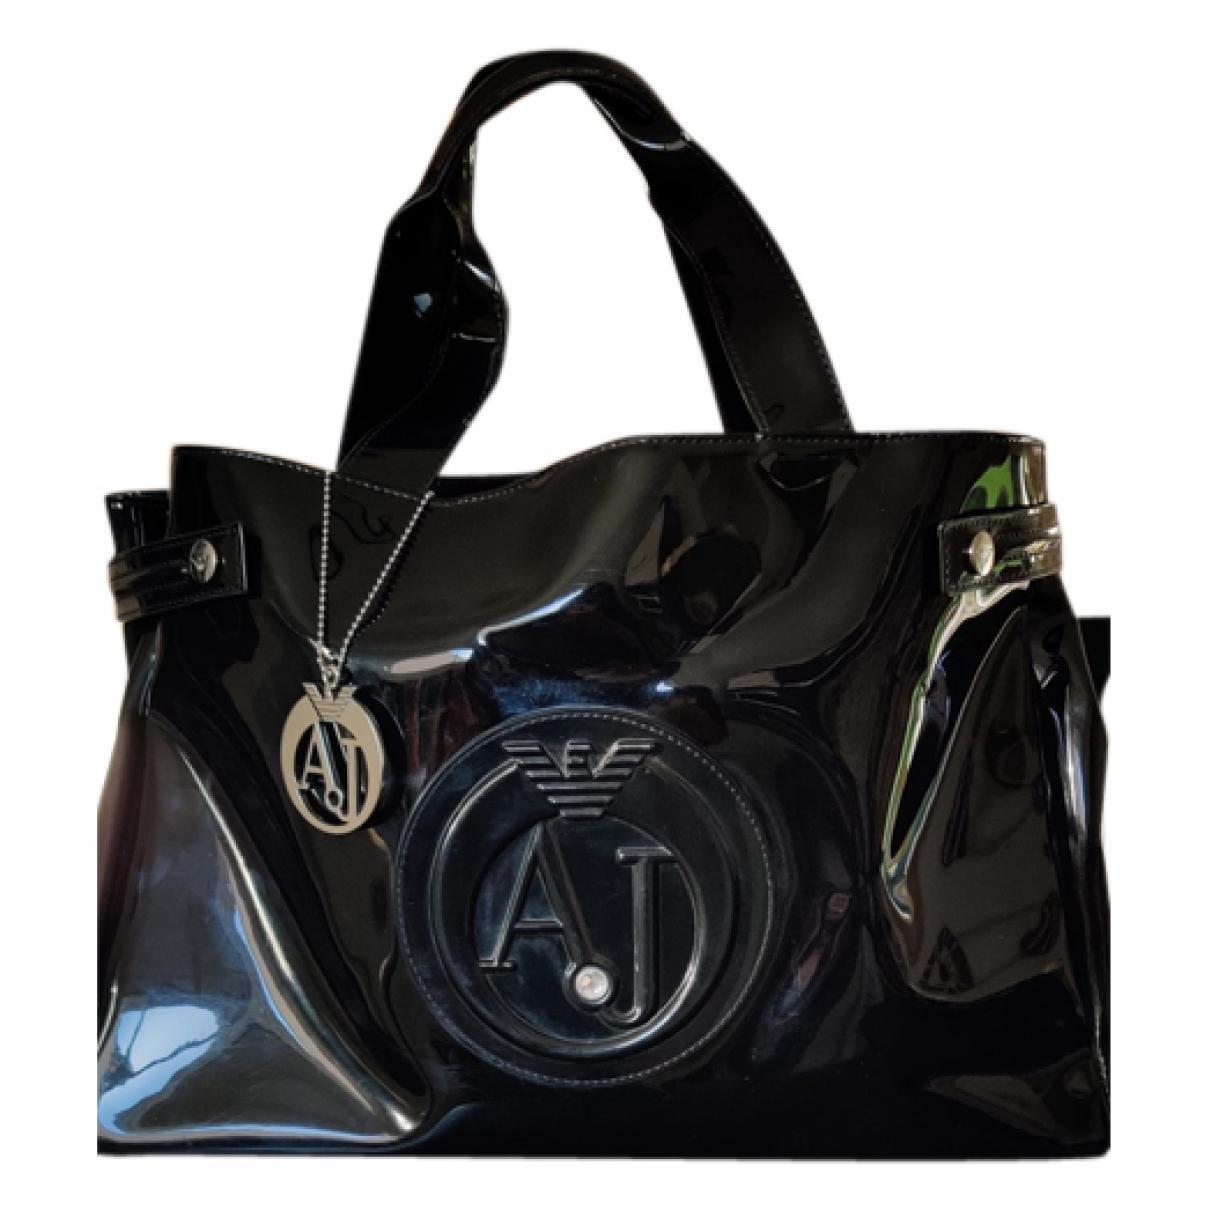 Armani Jeans \N Handtasche in  Schwarz Kunststoff